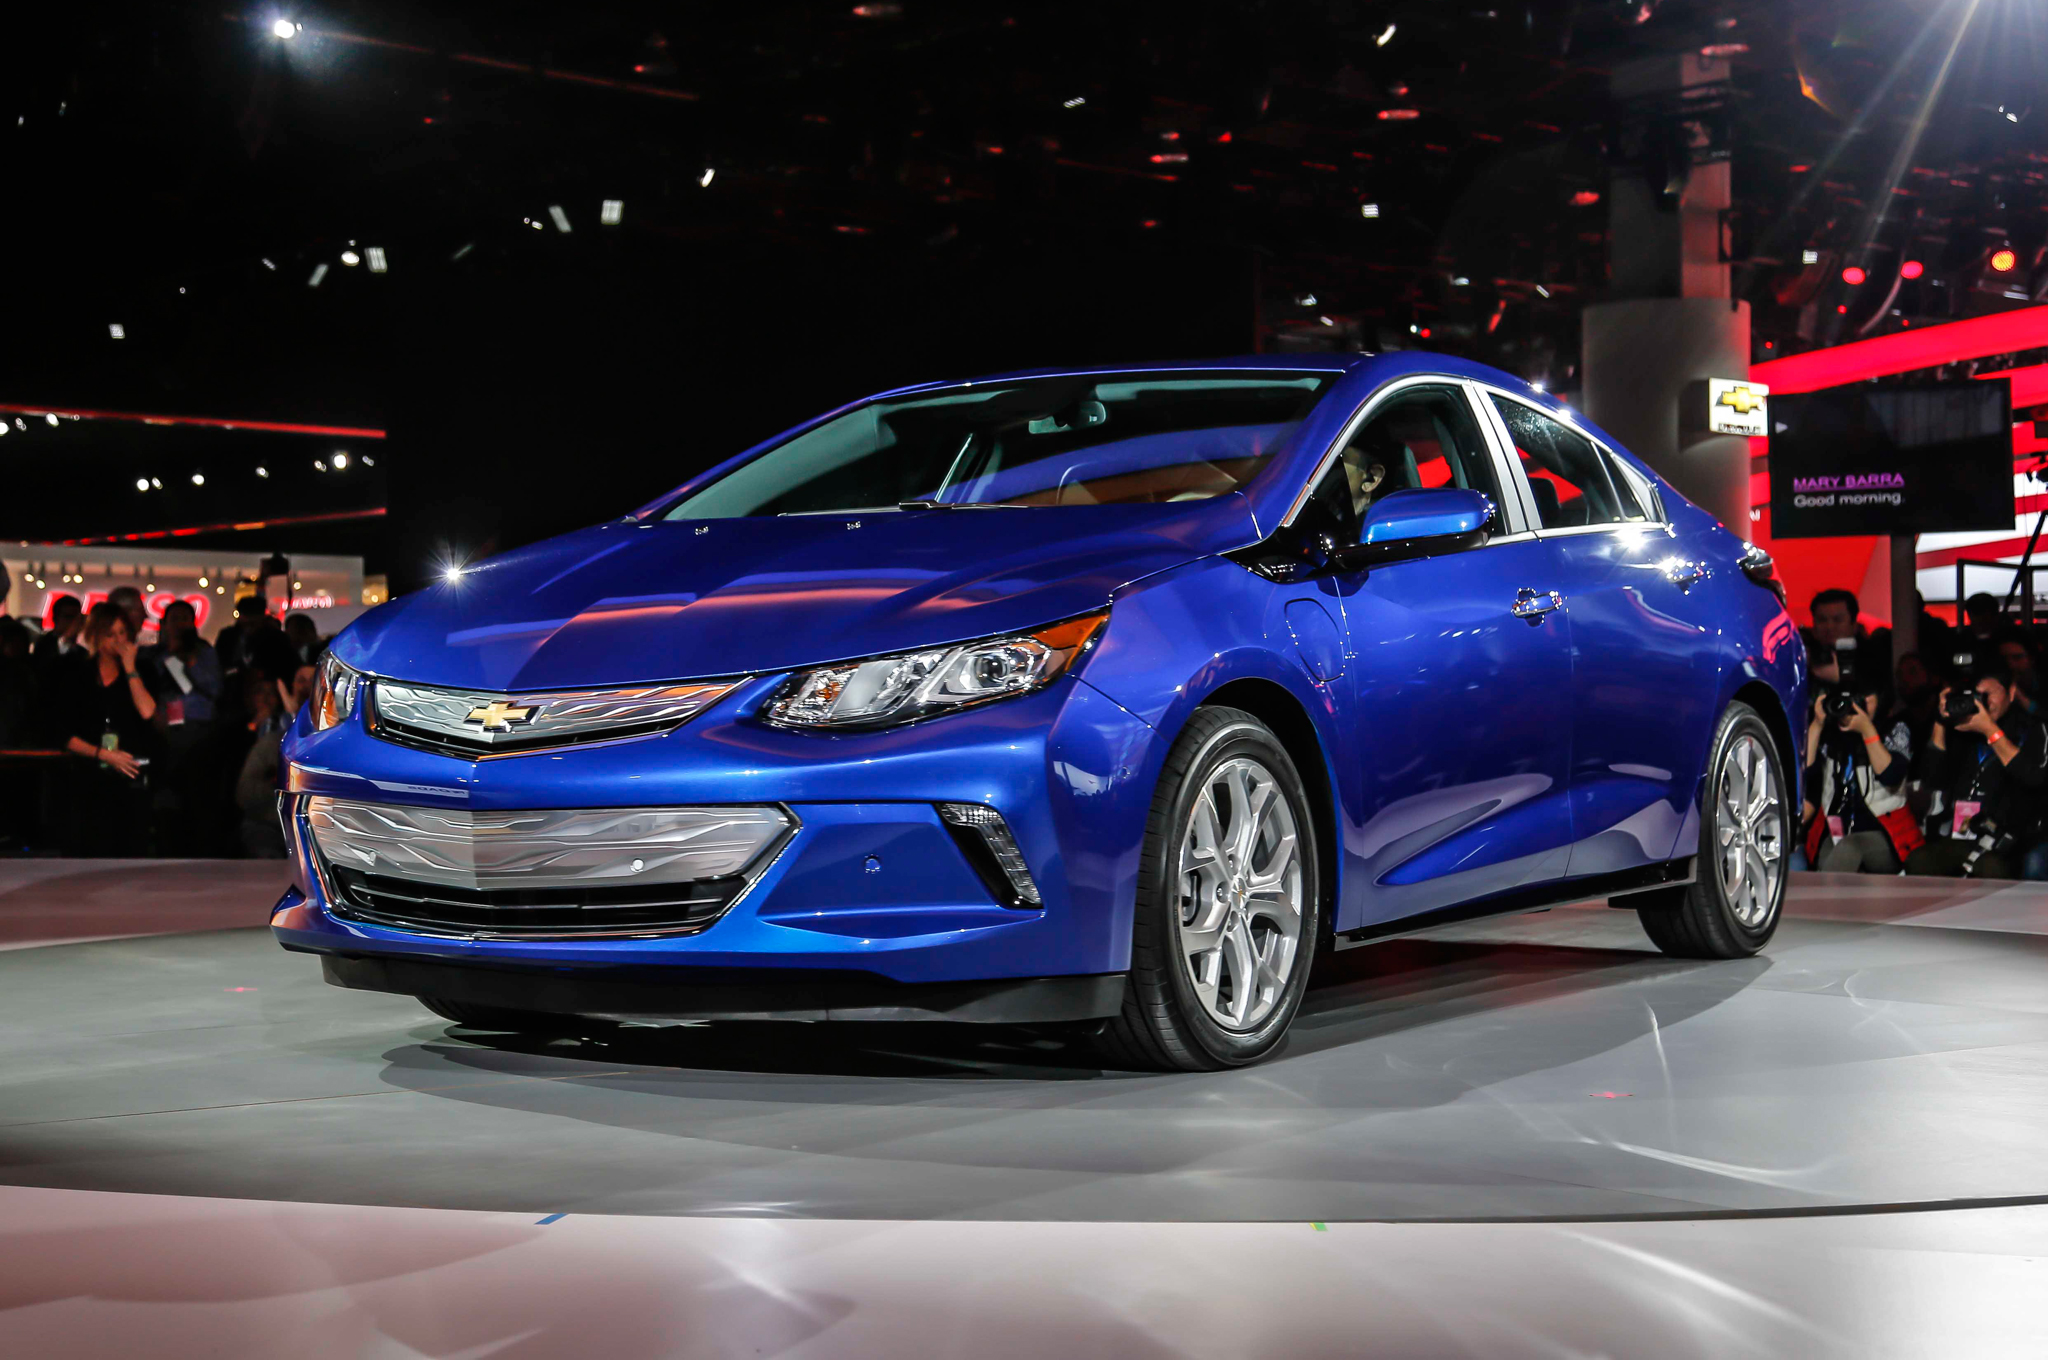 Next 2016 Chevrolet Volt Design